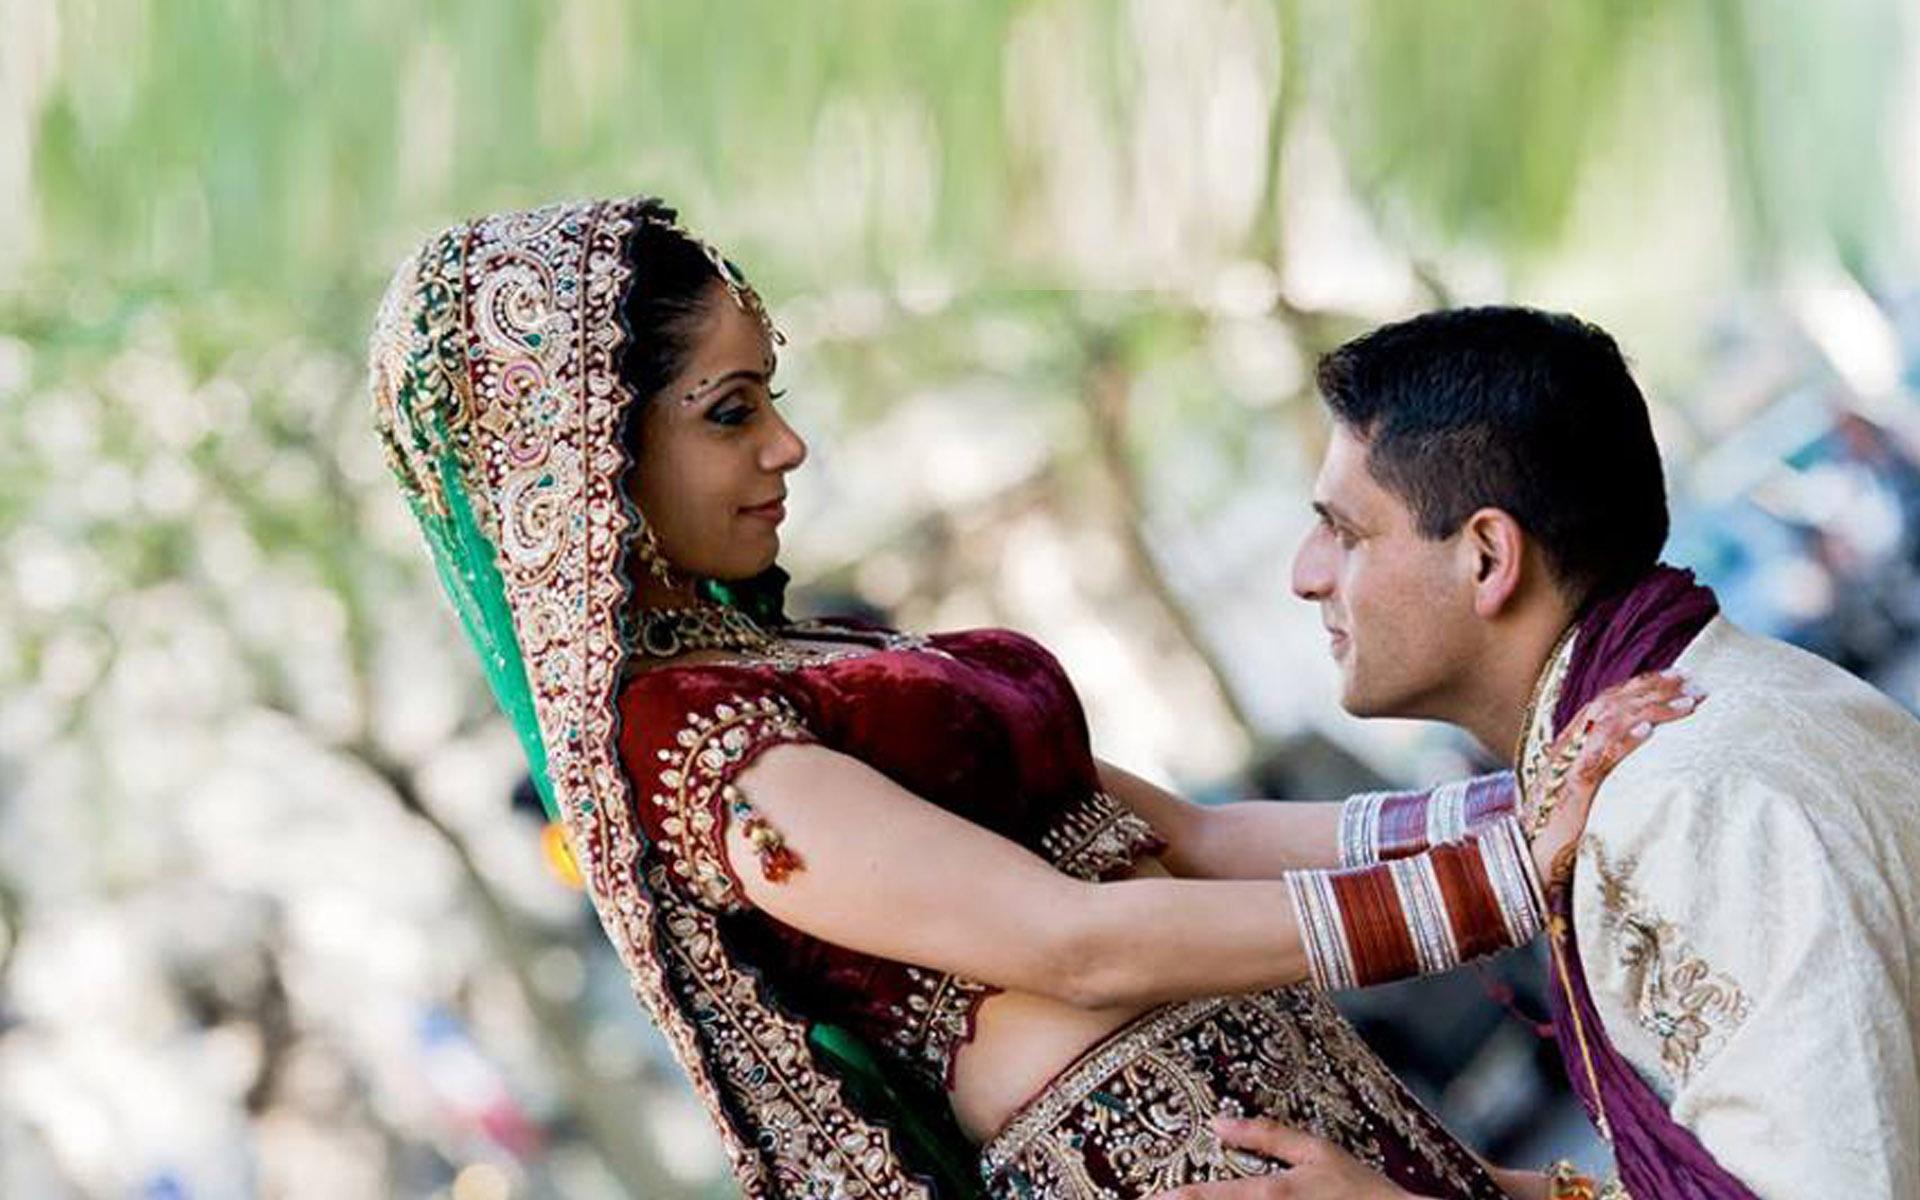 Punjabi Wedding Couple Wallpapers Love Couple Pics Full Hd 1920x1200 Download Hd Wallpaper Wallpapertip